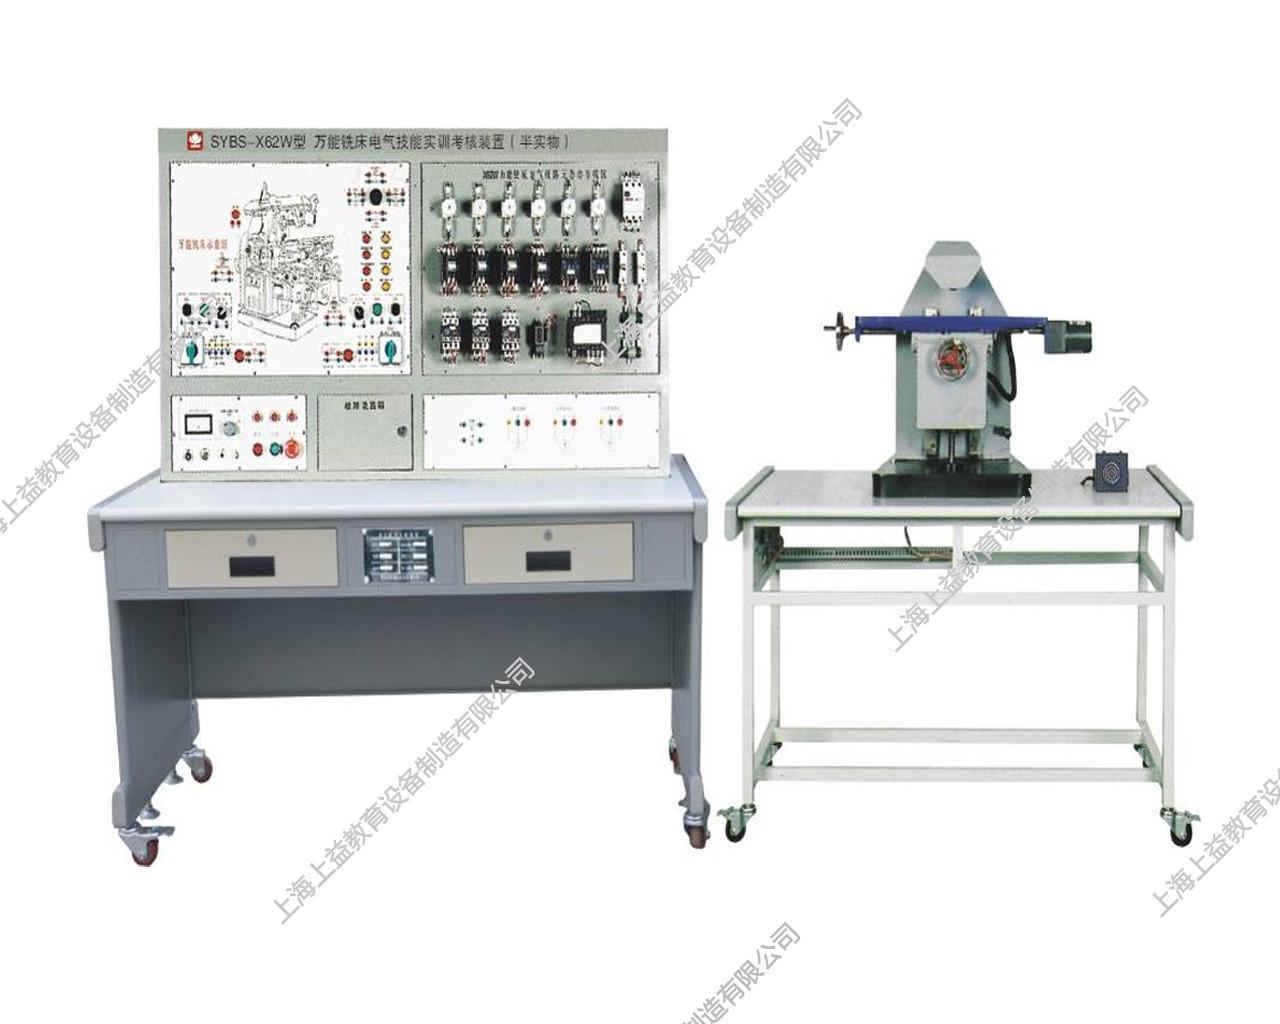 SYBS-M1432万能外圆磨床电气技能wwwlehu8viplehu68vip装置(半实物)